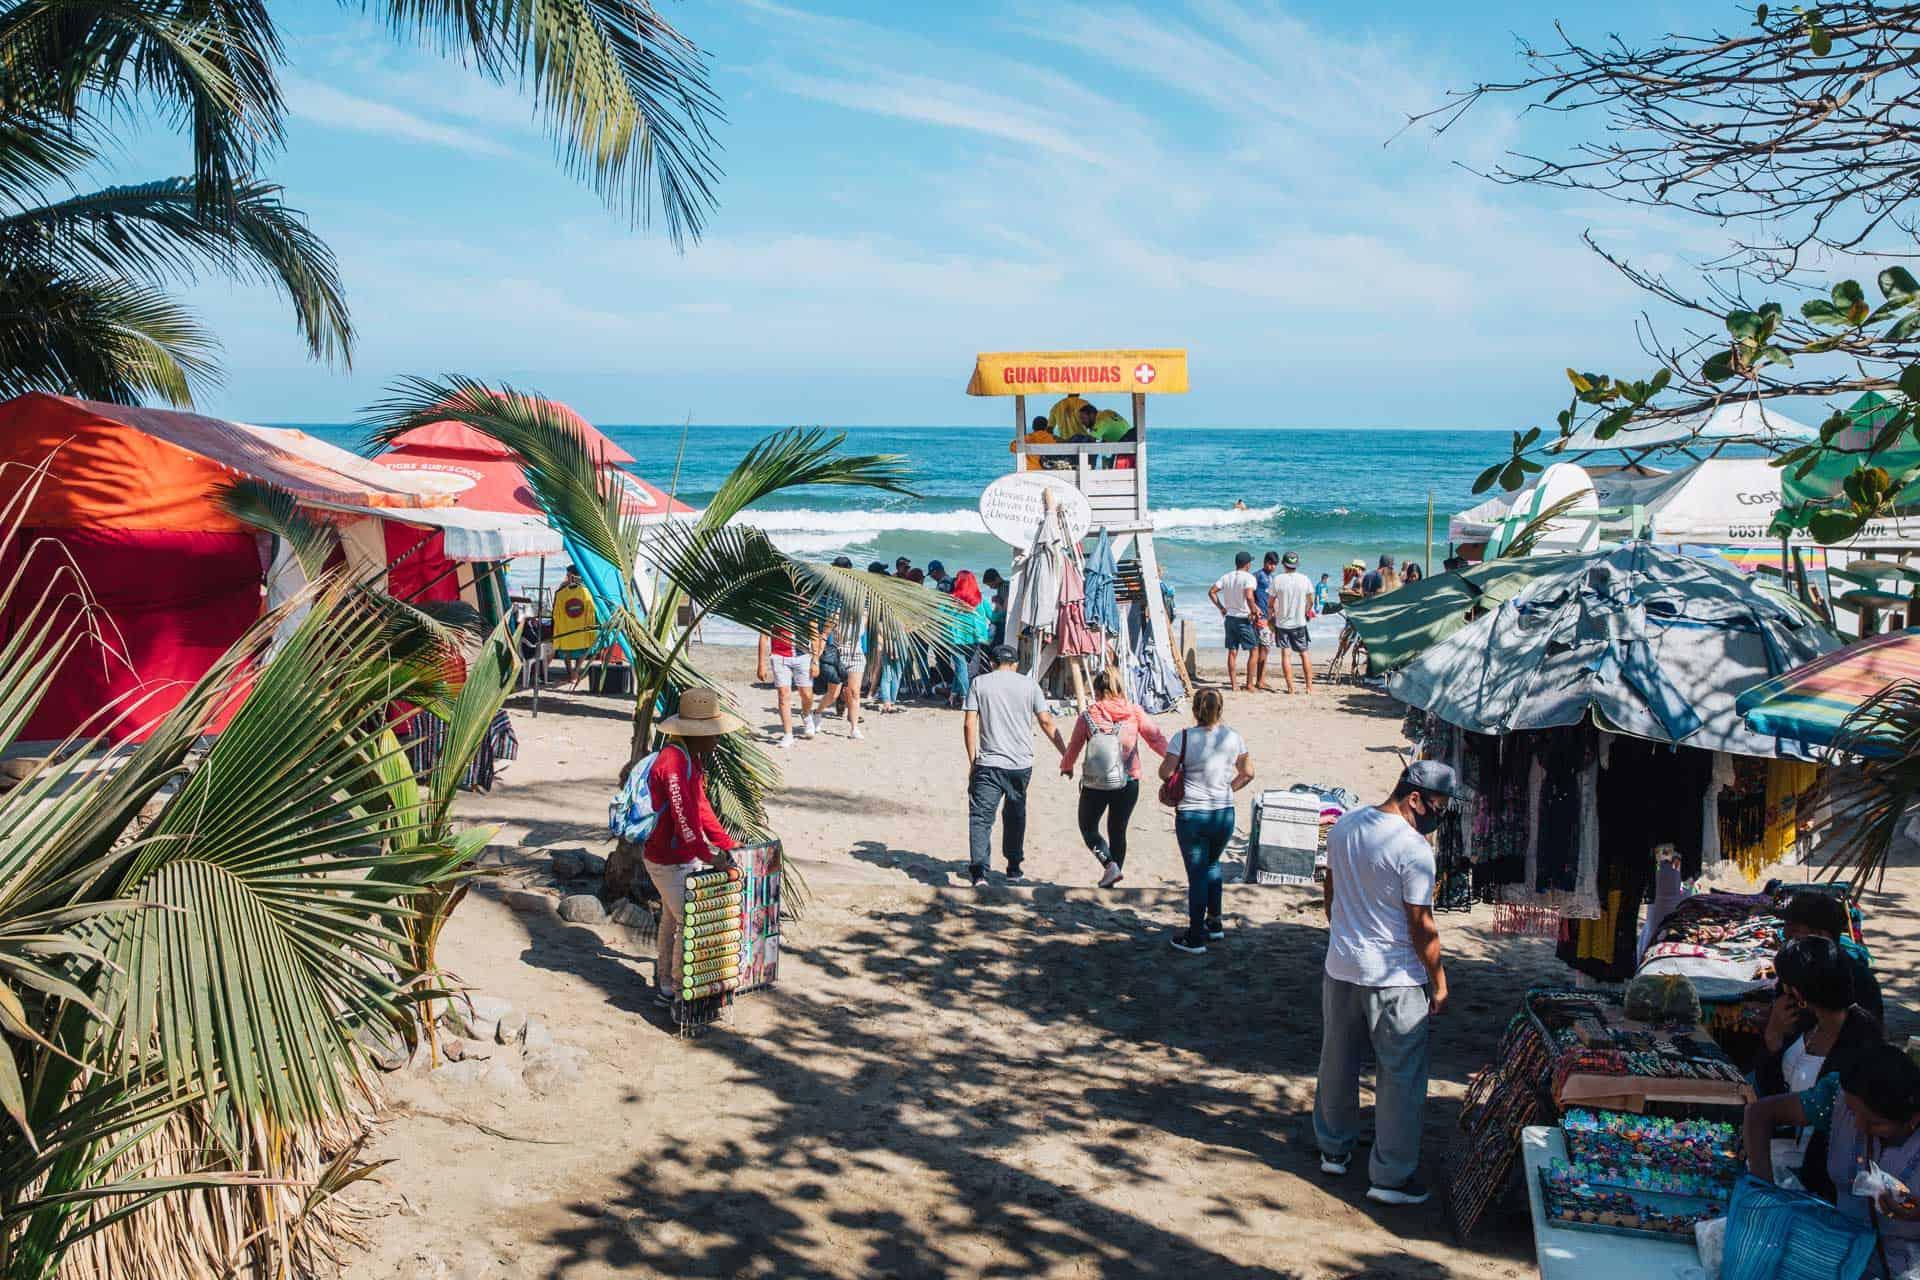 playa sayulita, sayulita playa, sayulita beach, playa sayulita nayarit